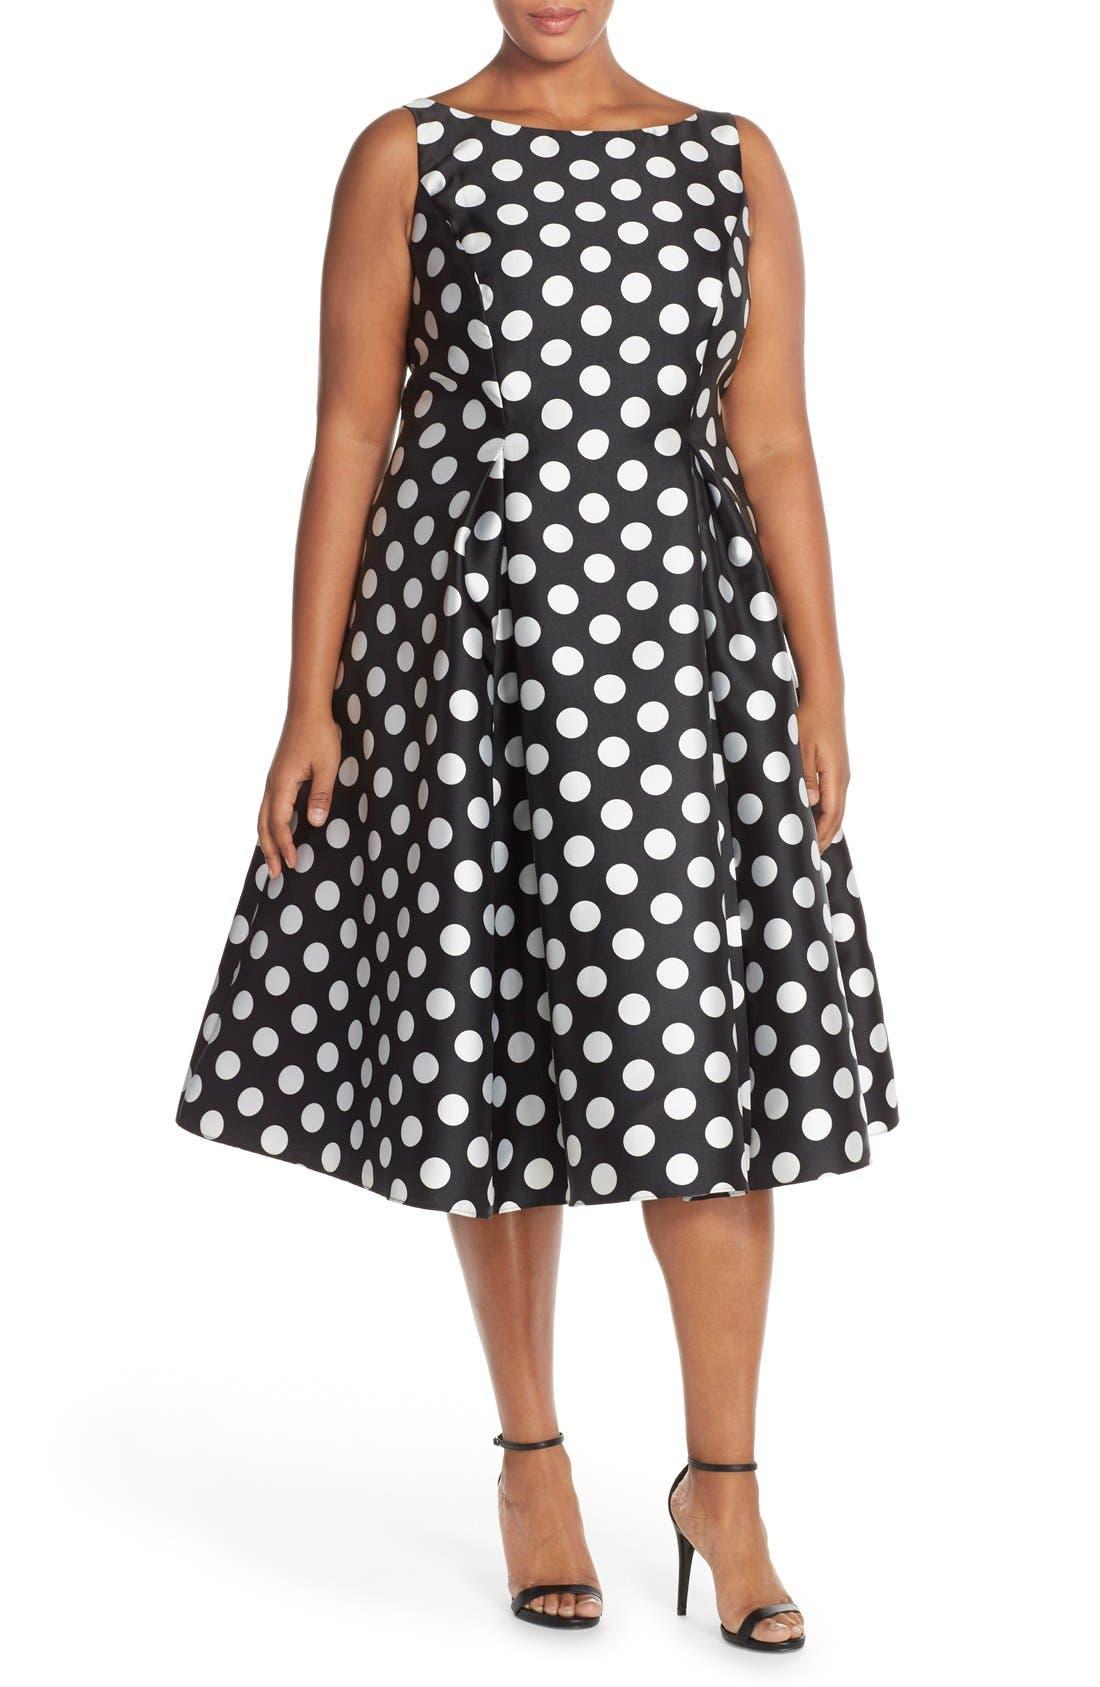 Alternate Image 1 Selected - Adrianna Papell Sleeveless Mikado Fit & Flare Polka Dot Midi Dress (Plus Size)